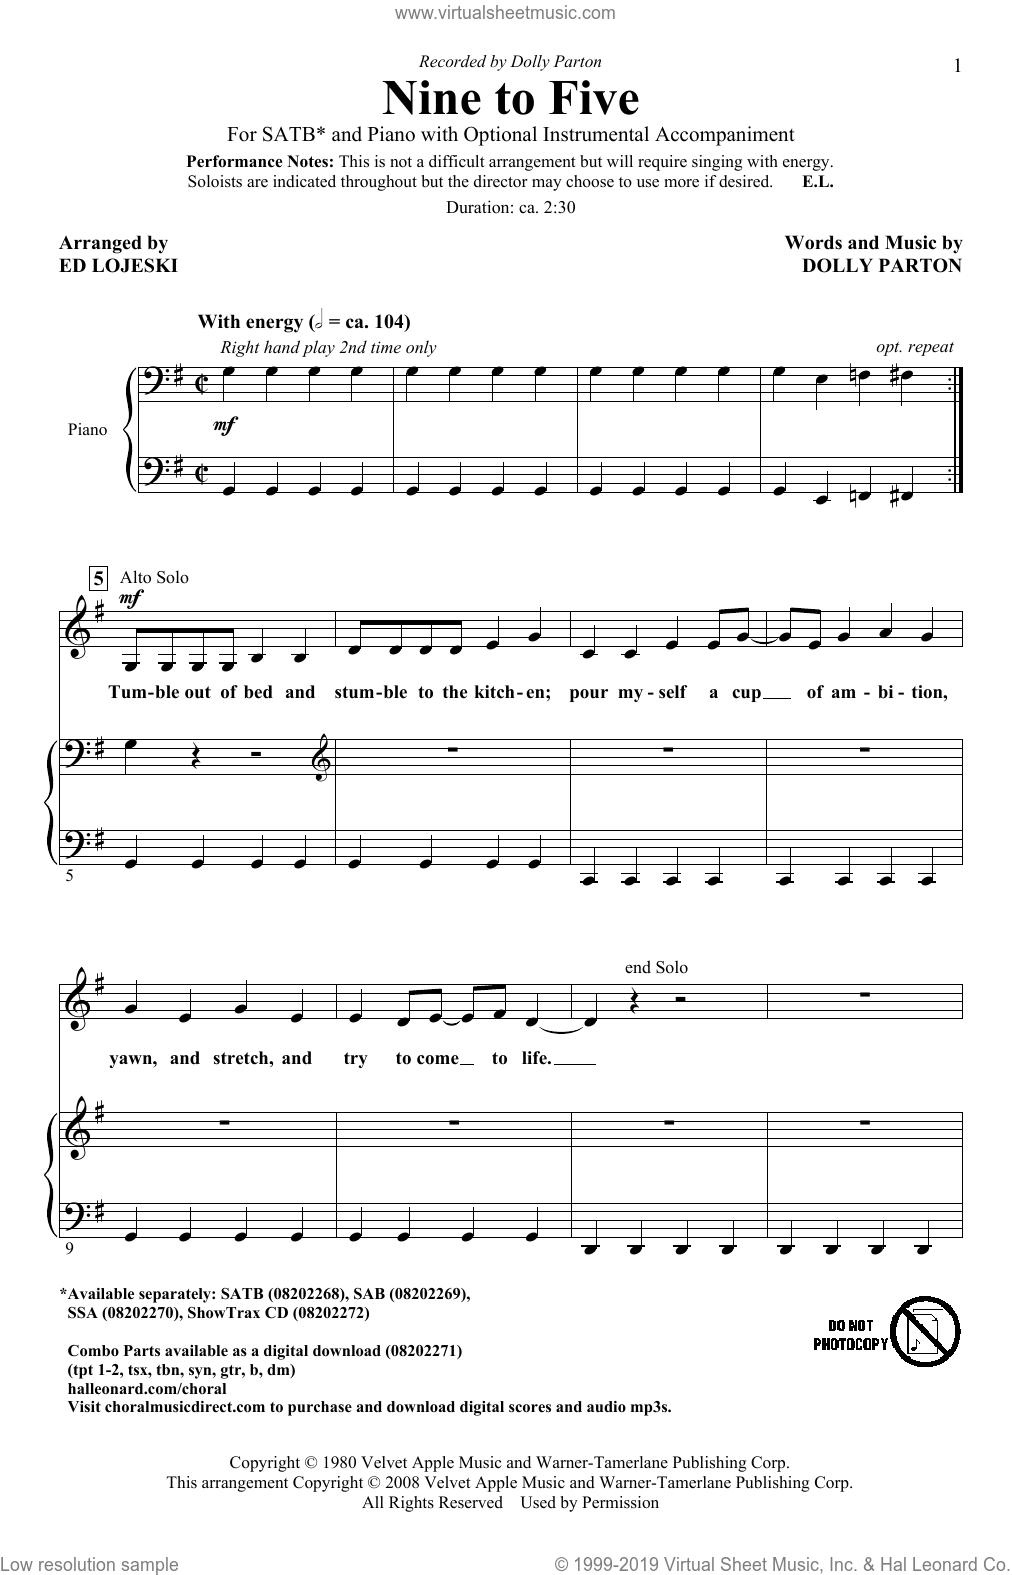 Nine To Five (arr. Ed Lojeski) sheet music for choir (SATB: soprano, alto, tenor, bass) by Dolly Parton and Ed Lojeski, intermediate skill level